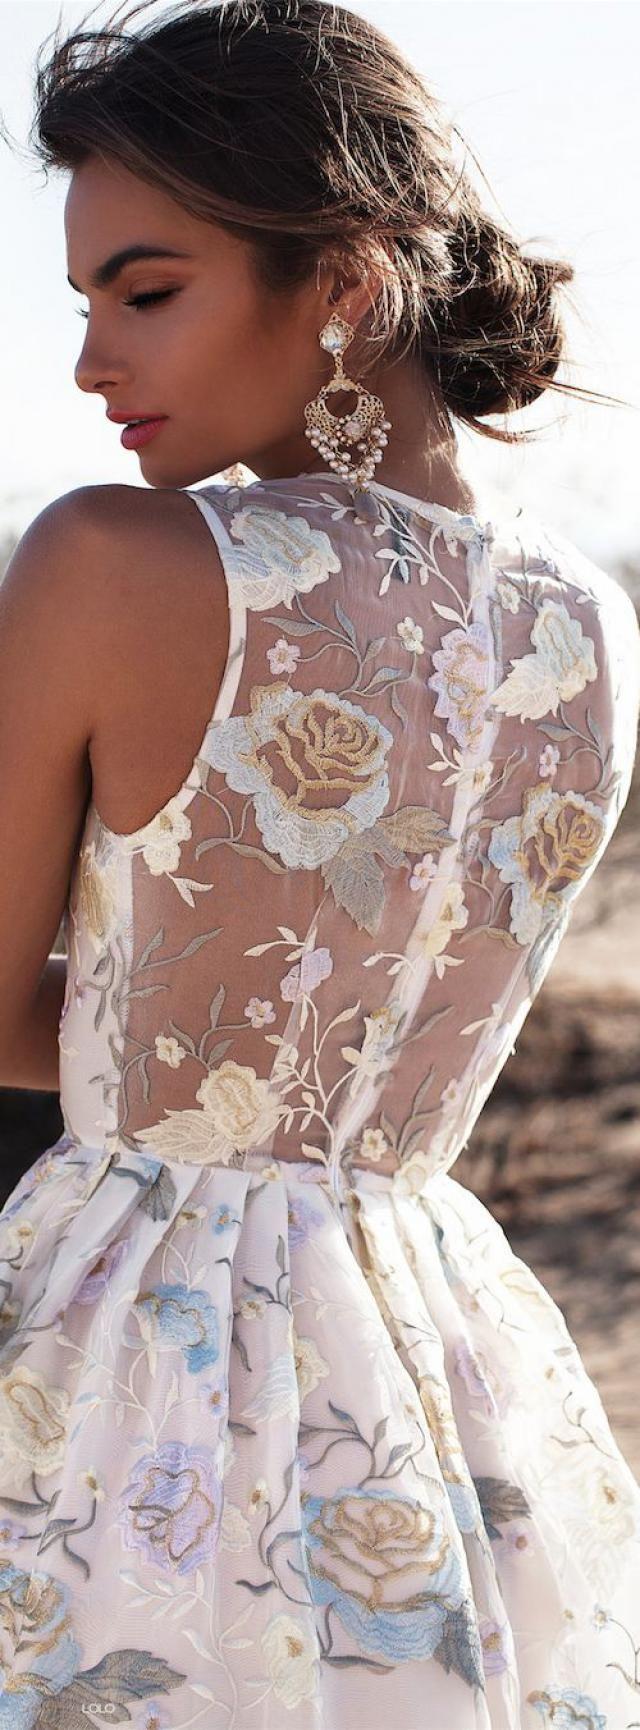 -white lace dress-